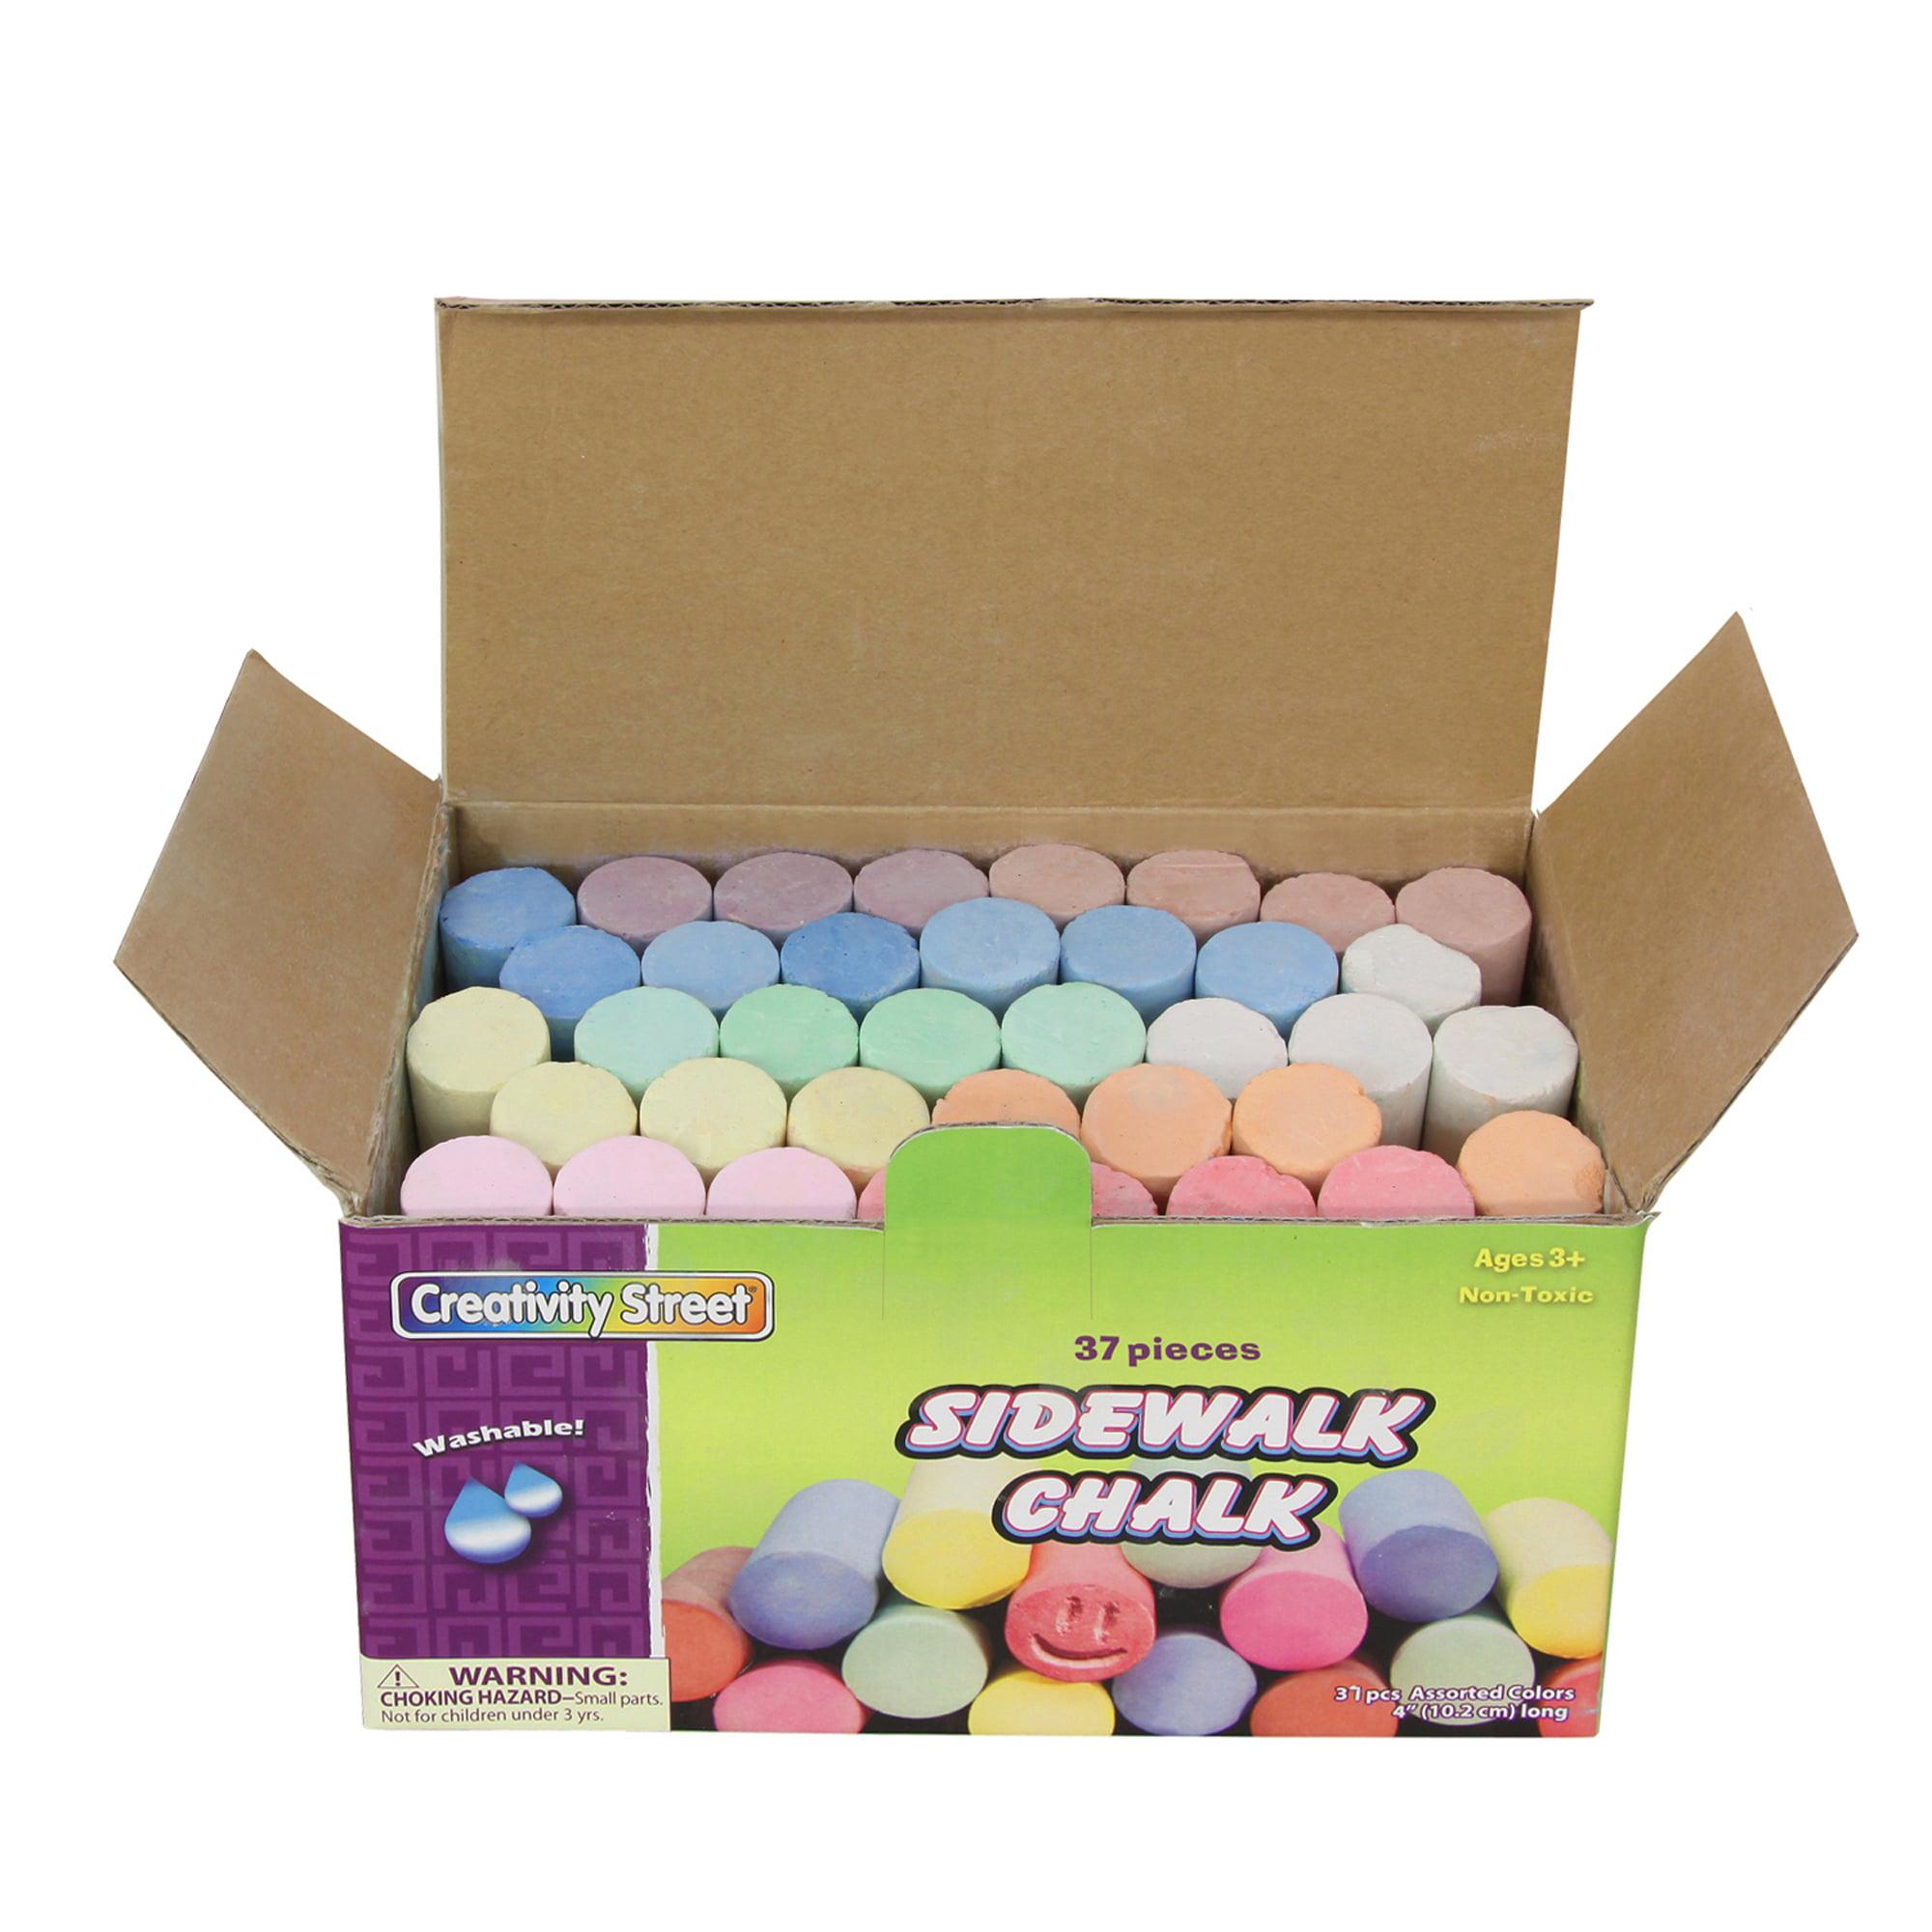 Creativity Street® Sidewalk Chalk, 3 Boxes of 37 Pieces